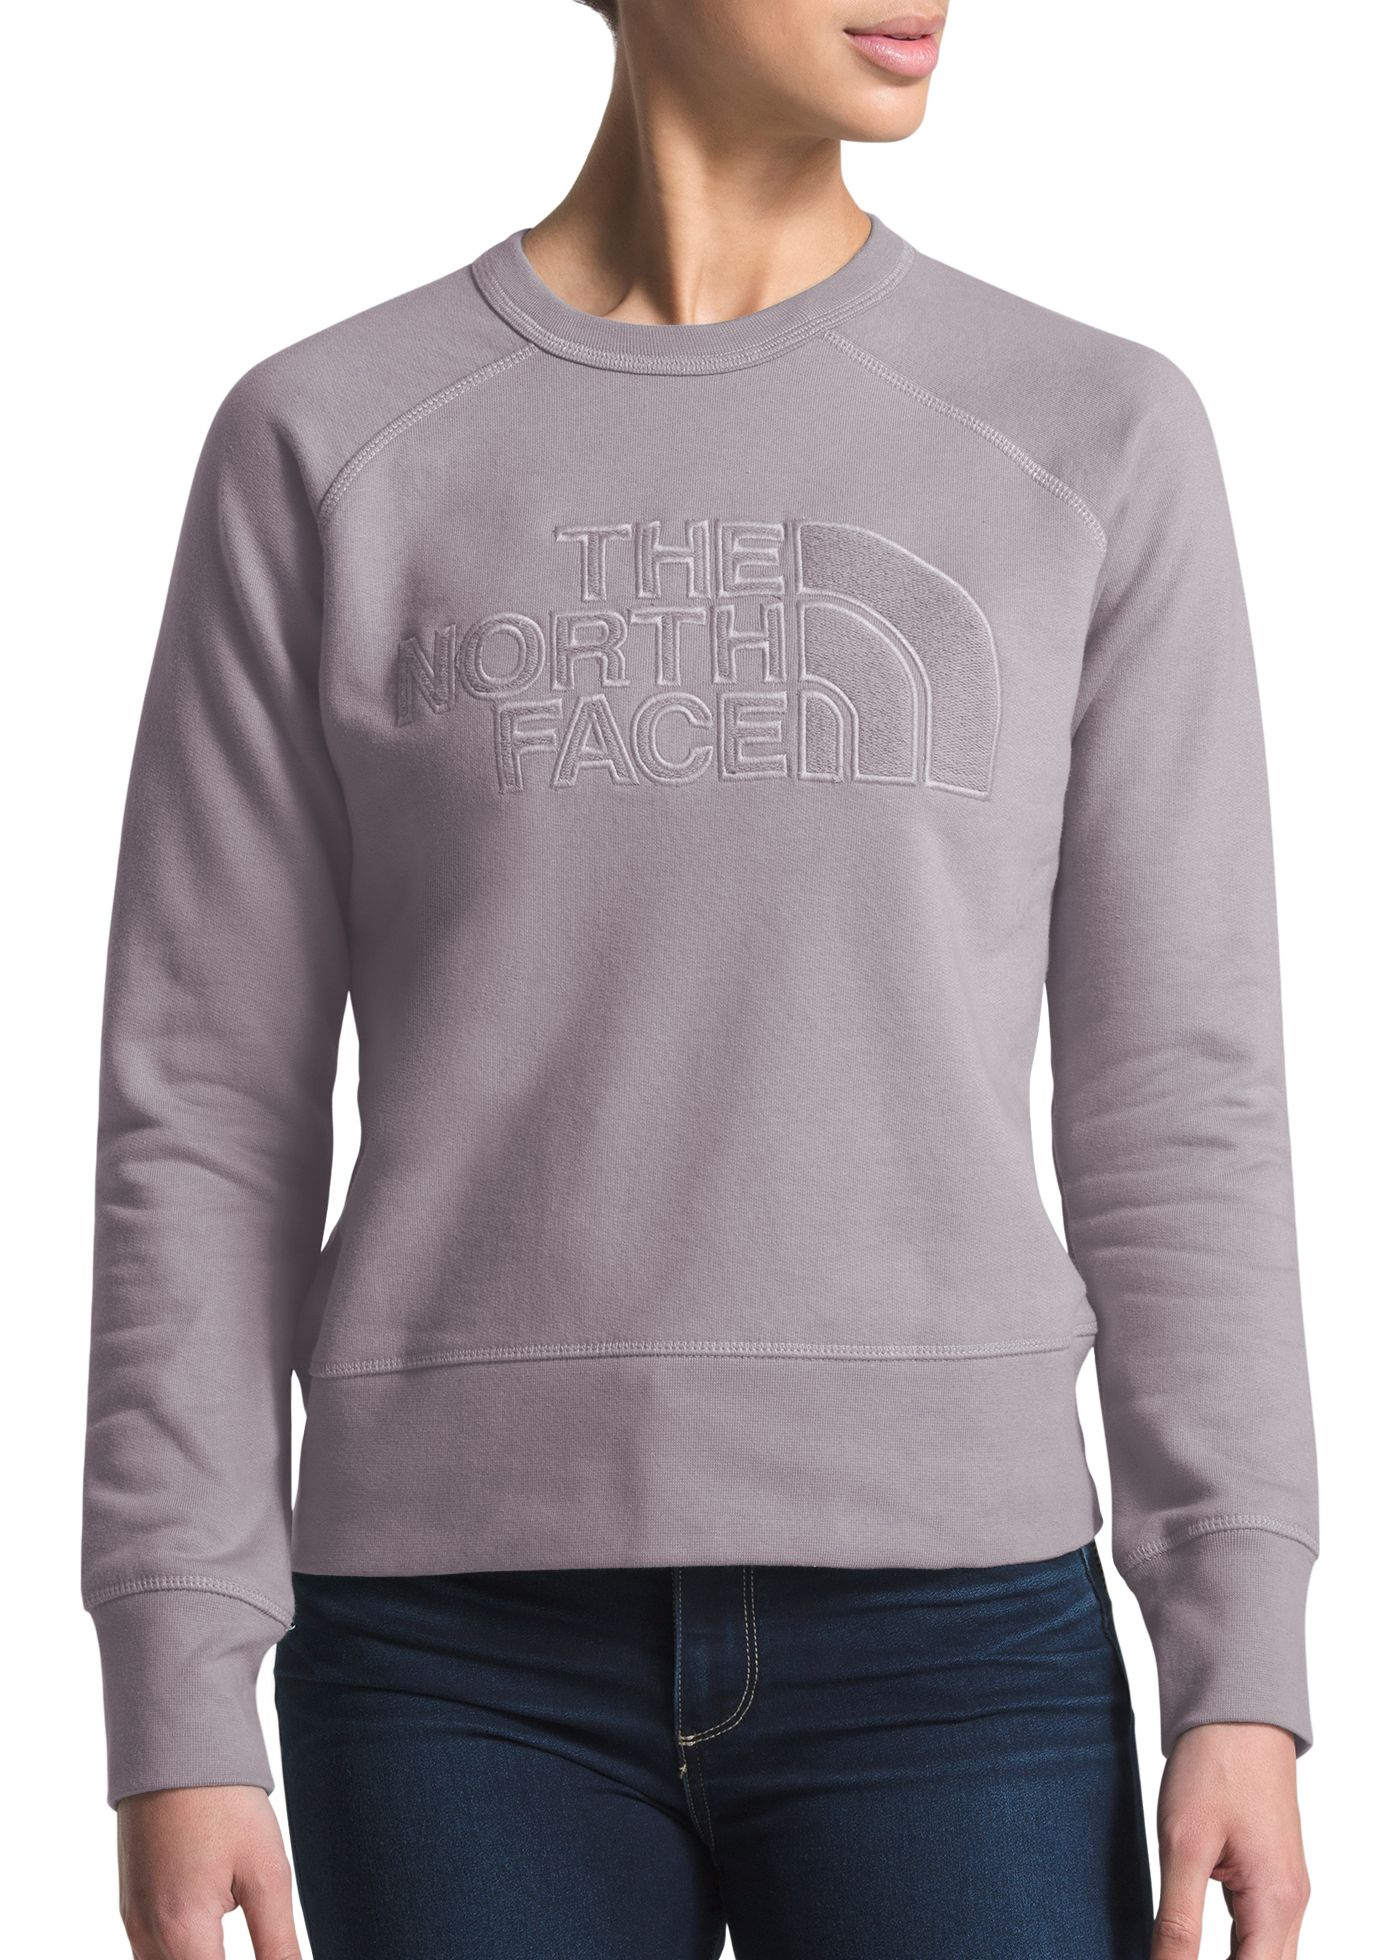 The North Face Women's Sobranta Crew Sweatshirt